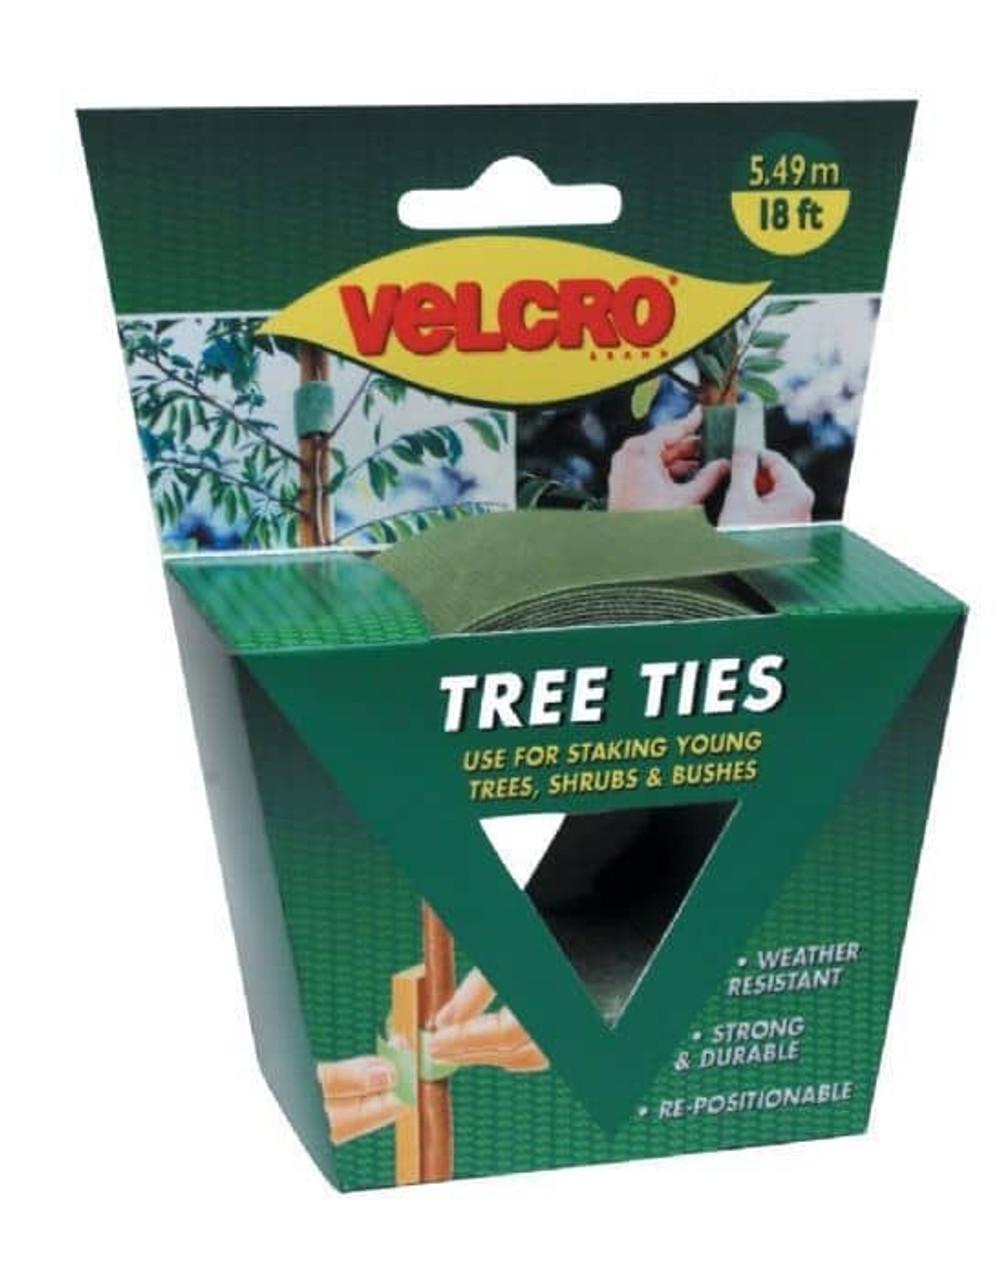 Velcro 5.4m Tree Ties